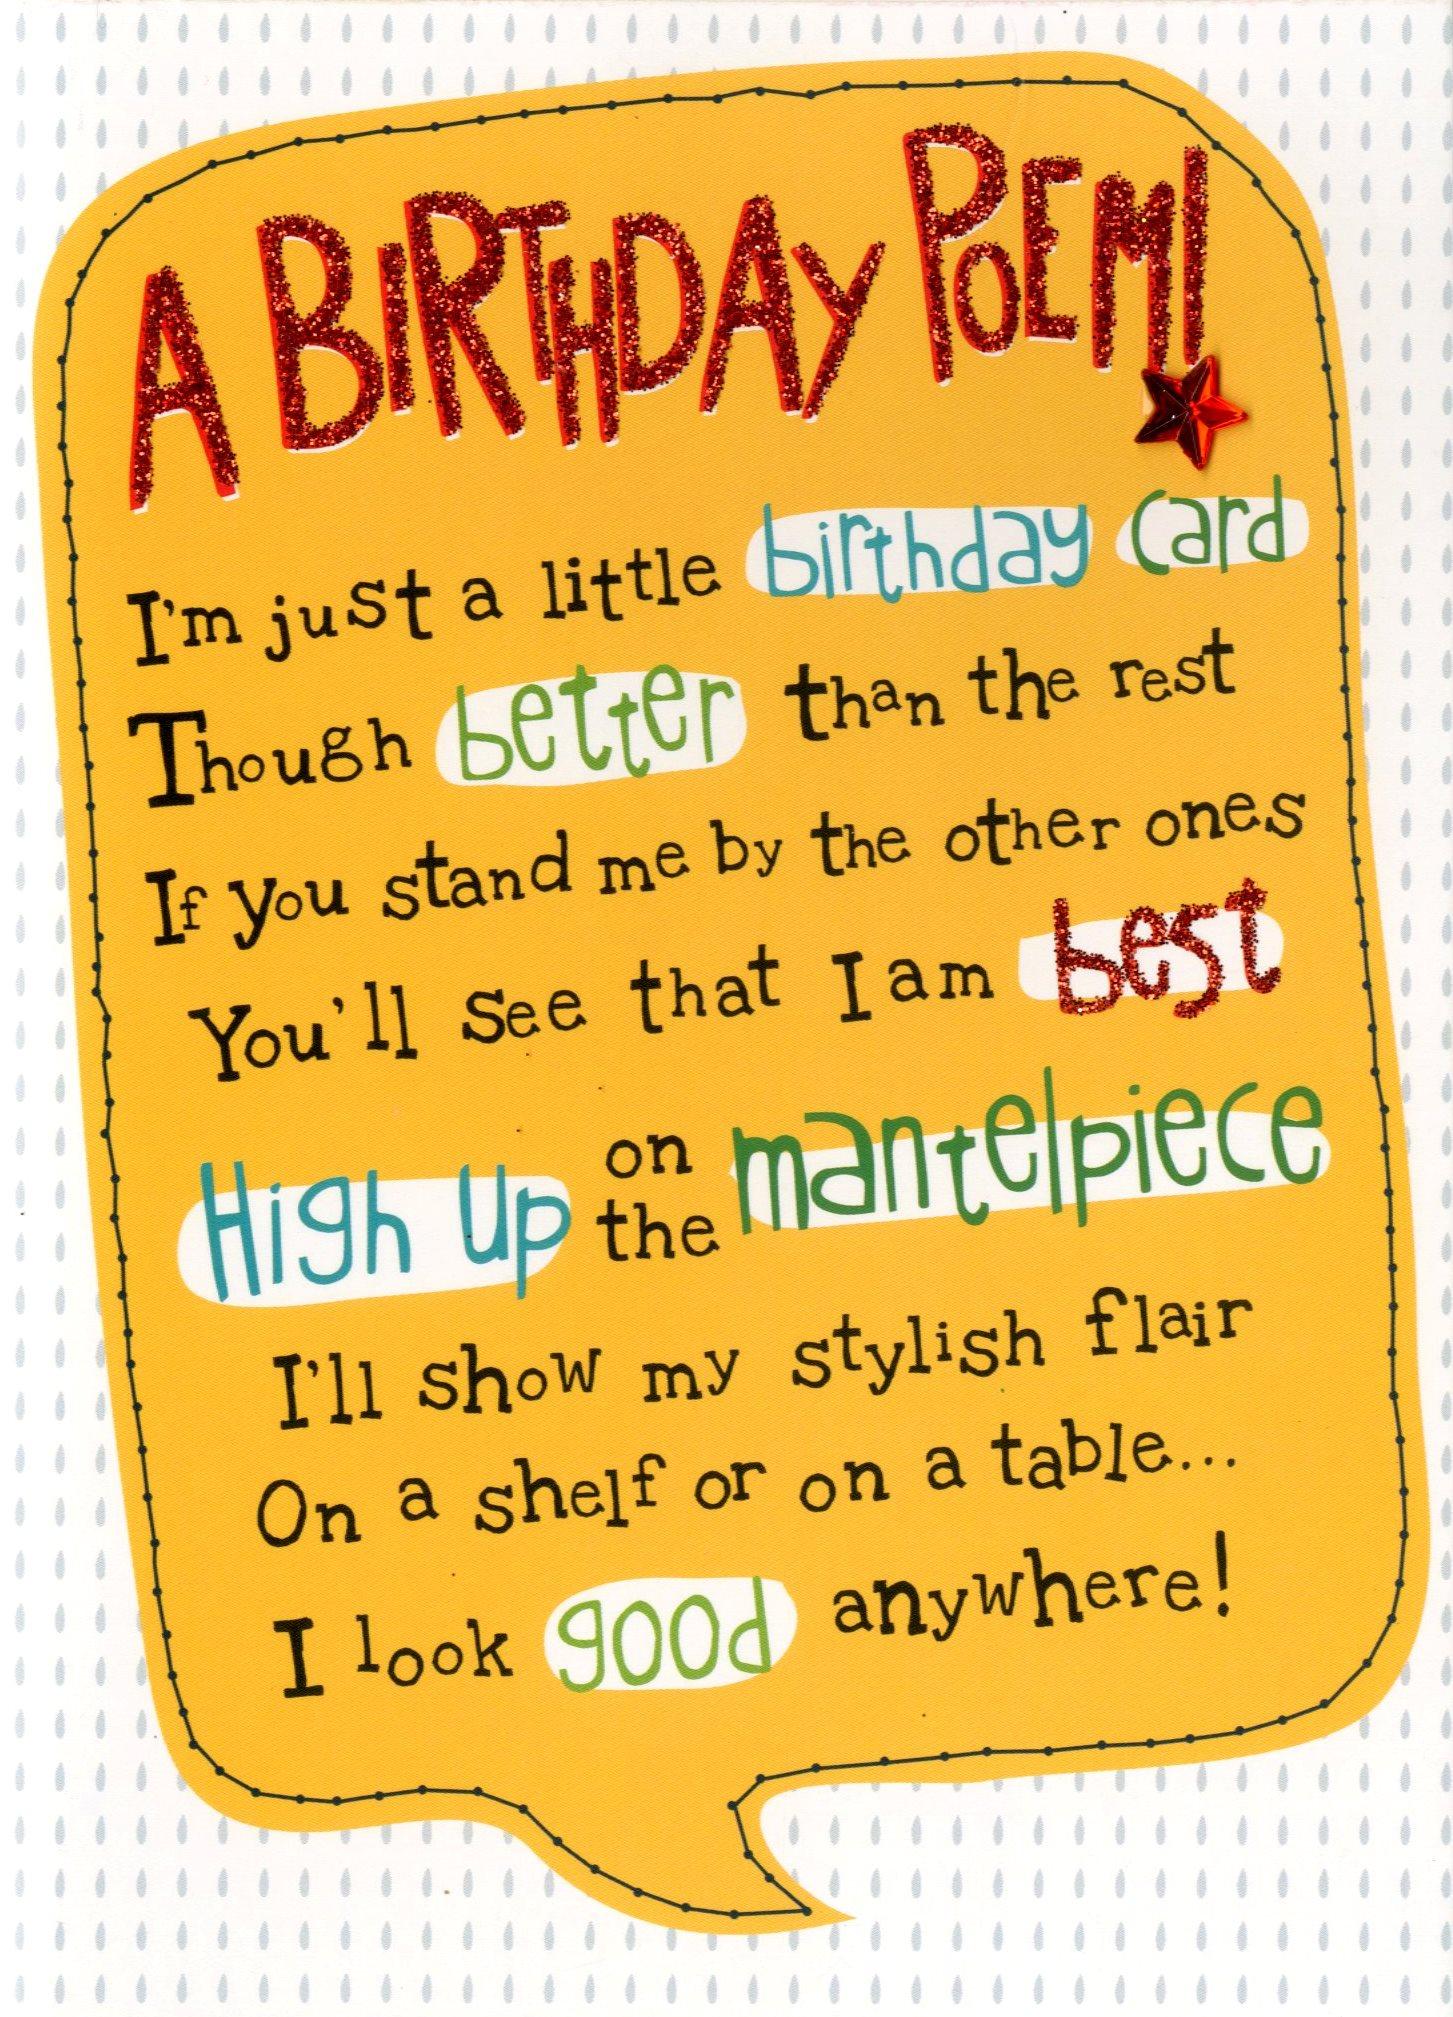 A birthday poem greeting card cards love kates a birthday poem greeting card m4hsunfo